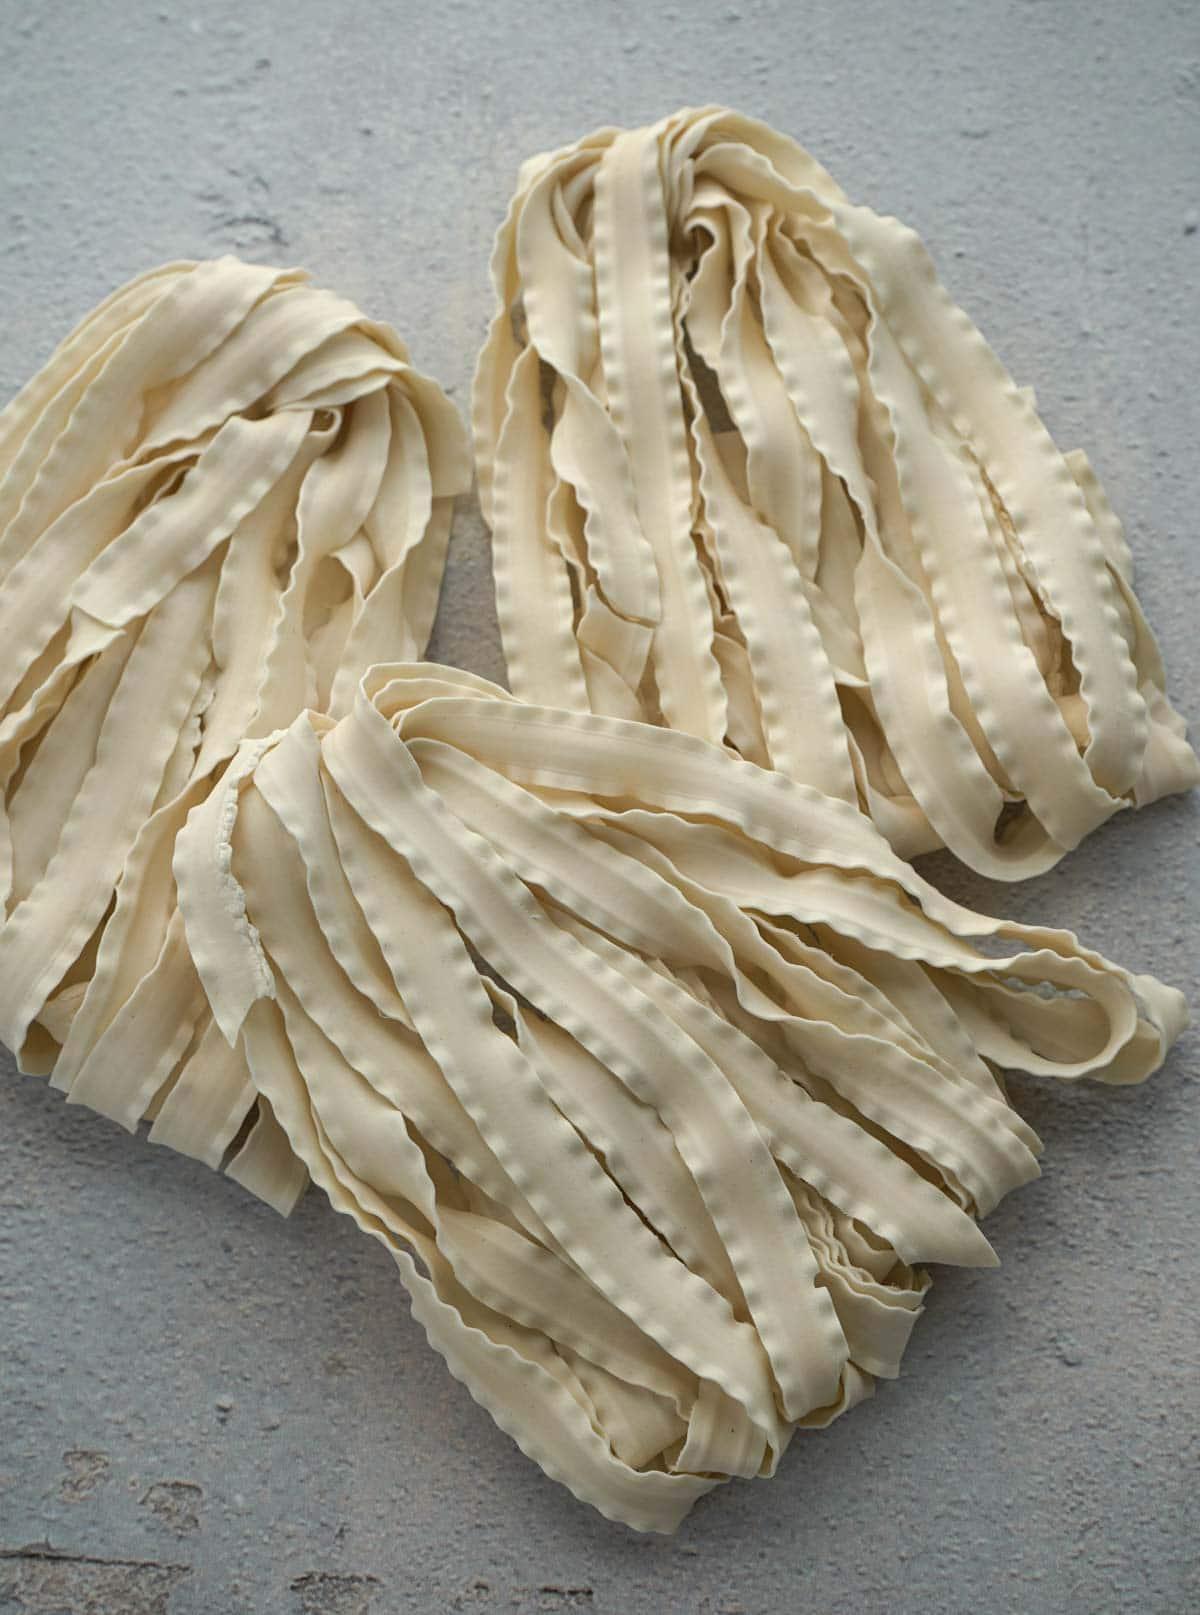 Dried knife-cut noodles.